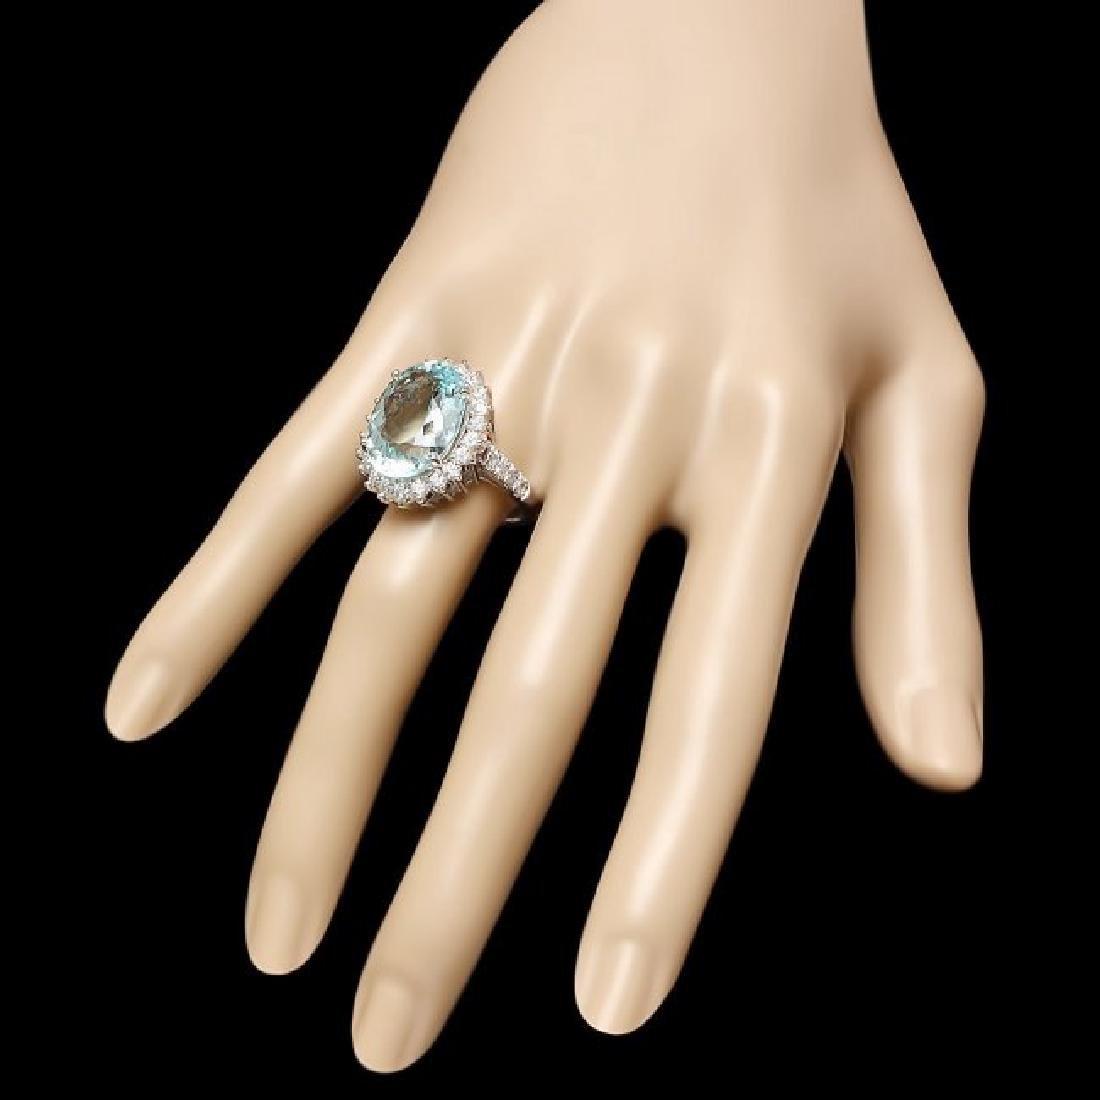 14k Gold 10.50ct Aquamarine 1.50ct Diamond Ring - 3